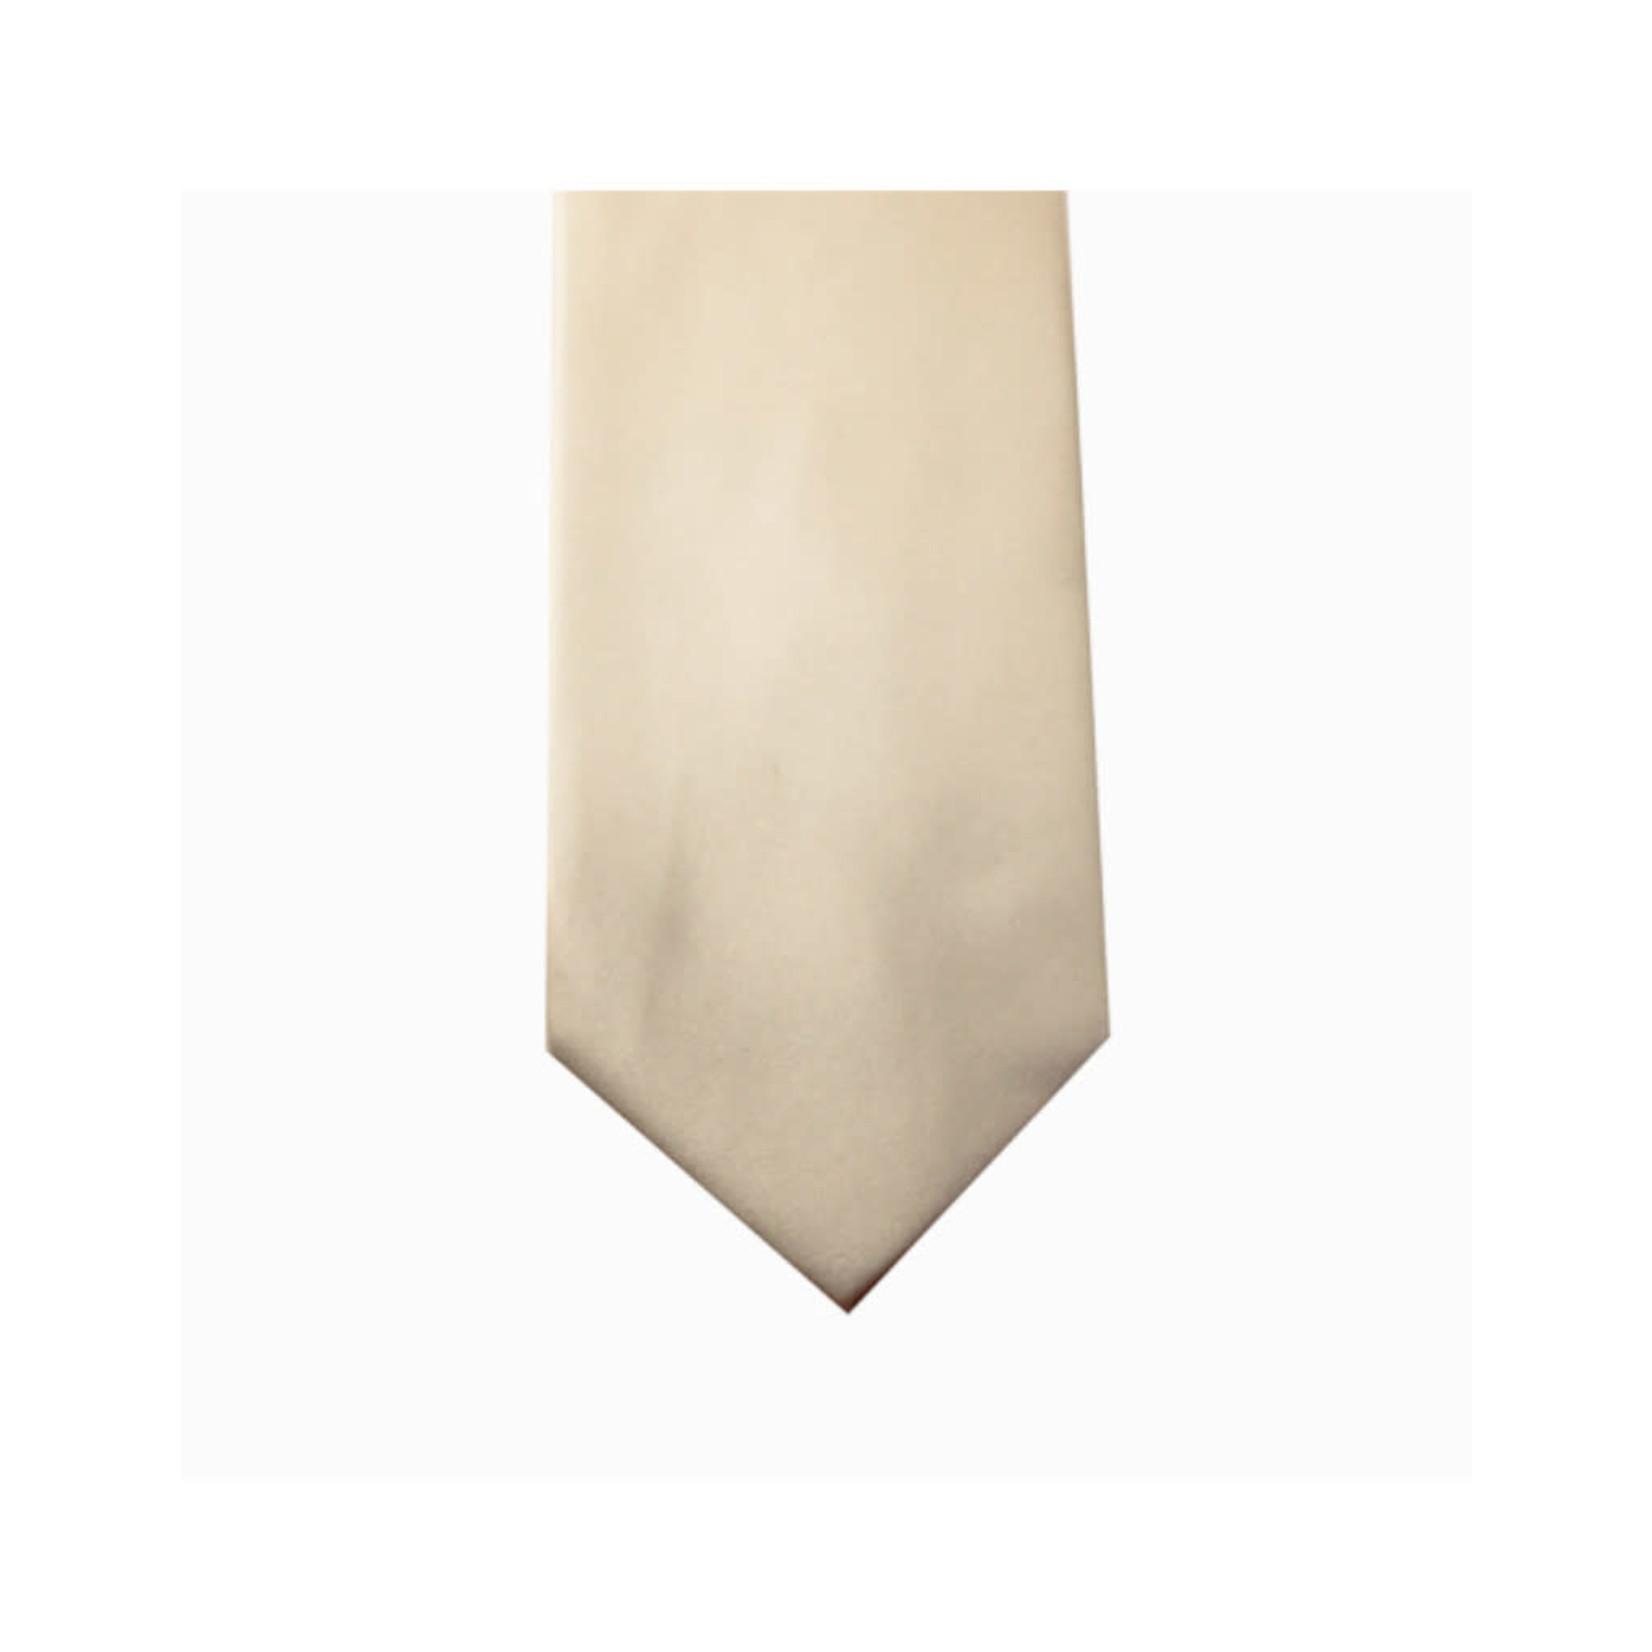 Knotz M100-33 Solid Ecru Tie